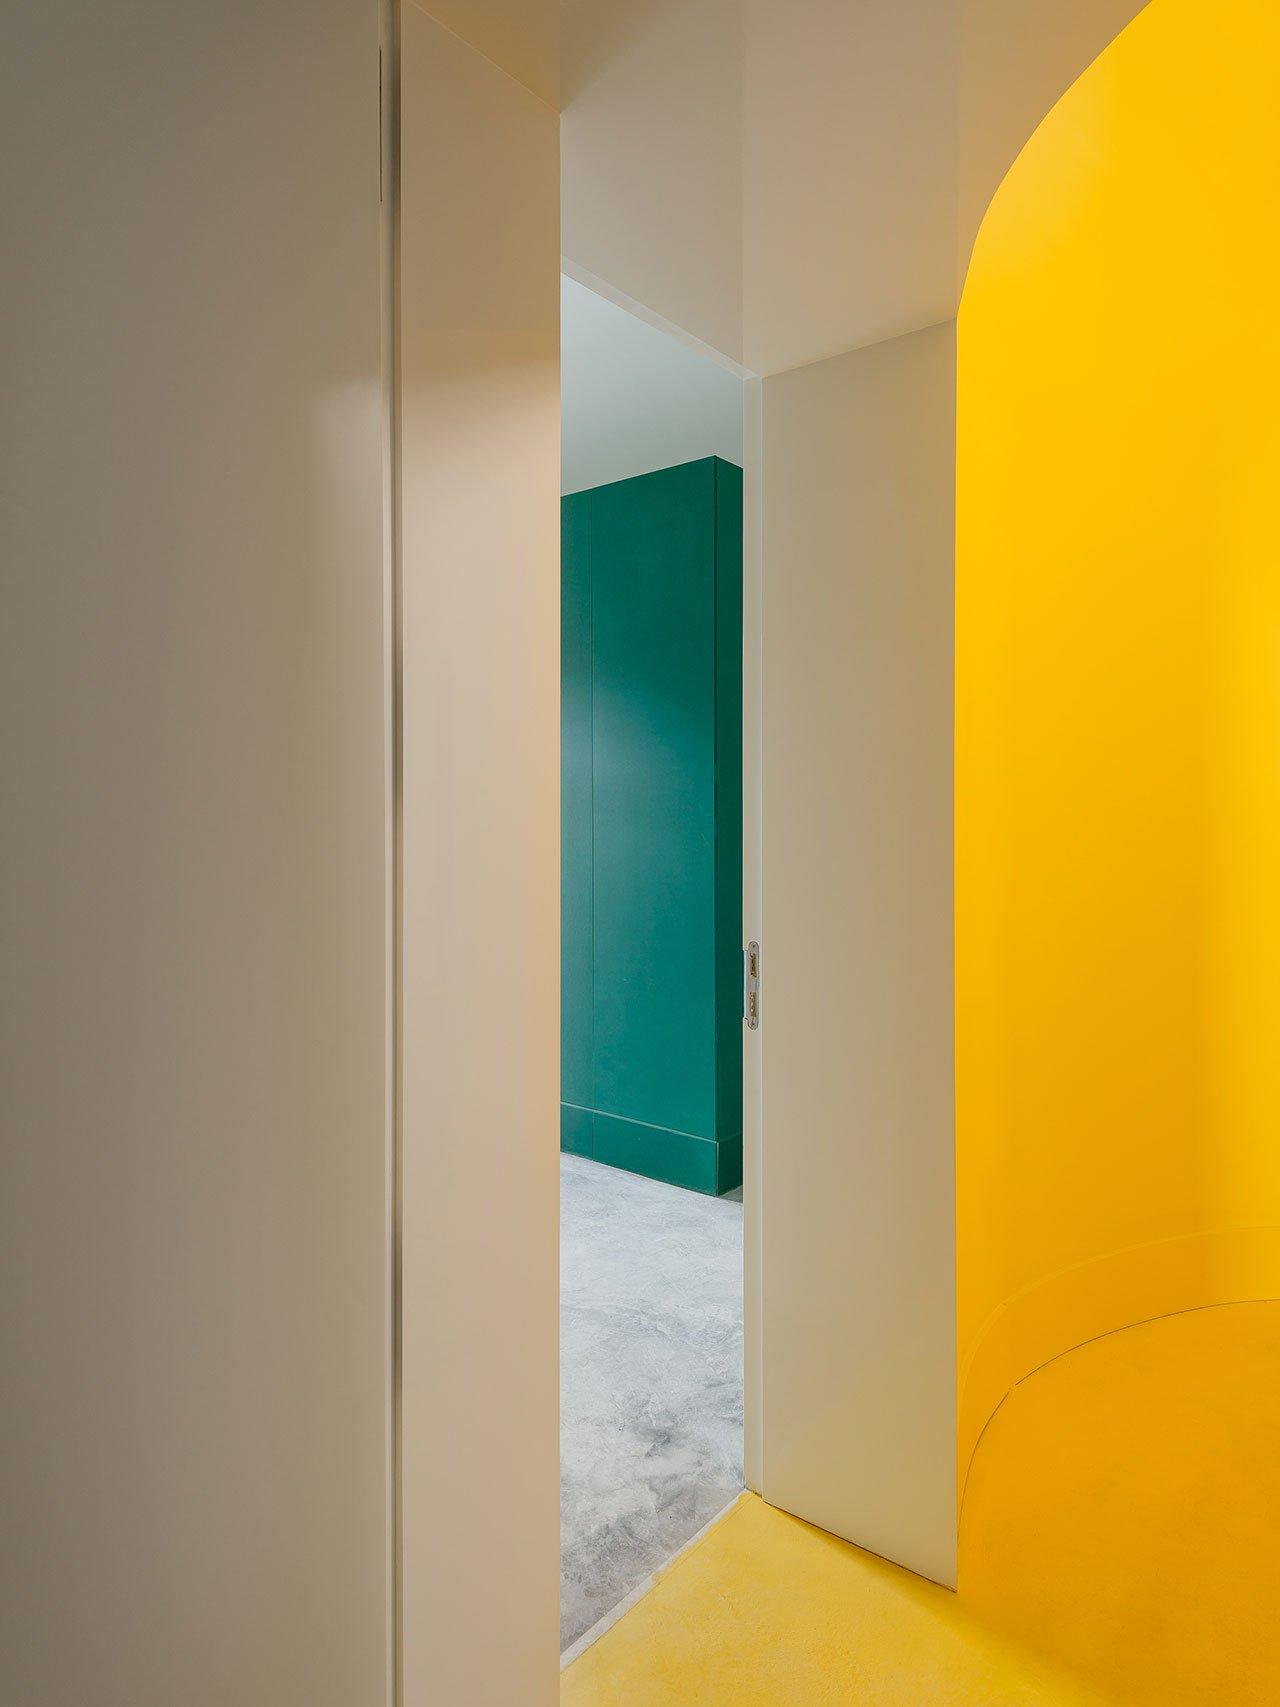 s6_hostel_in_parede_cascais_portugal_aurora_arquitectos_photo_do_mal_o_menos_yatzer.jpg